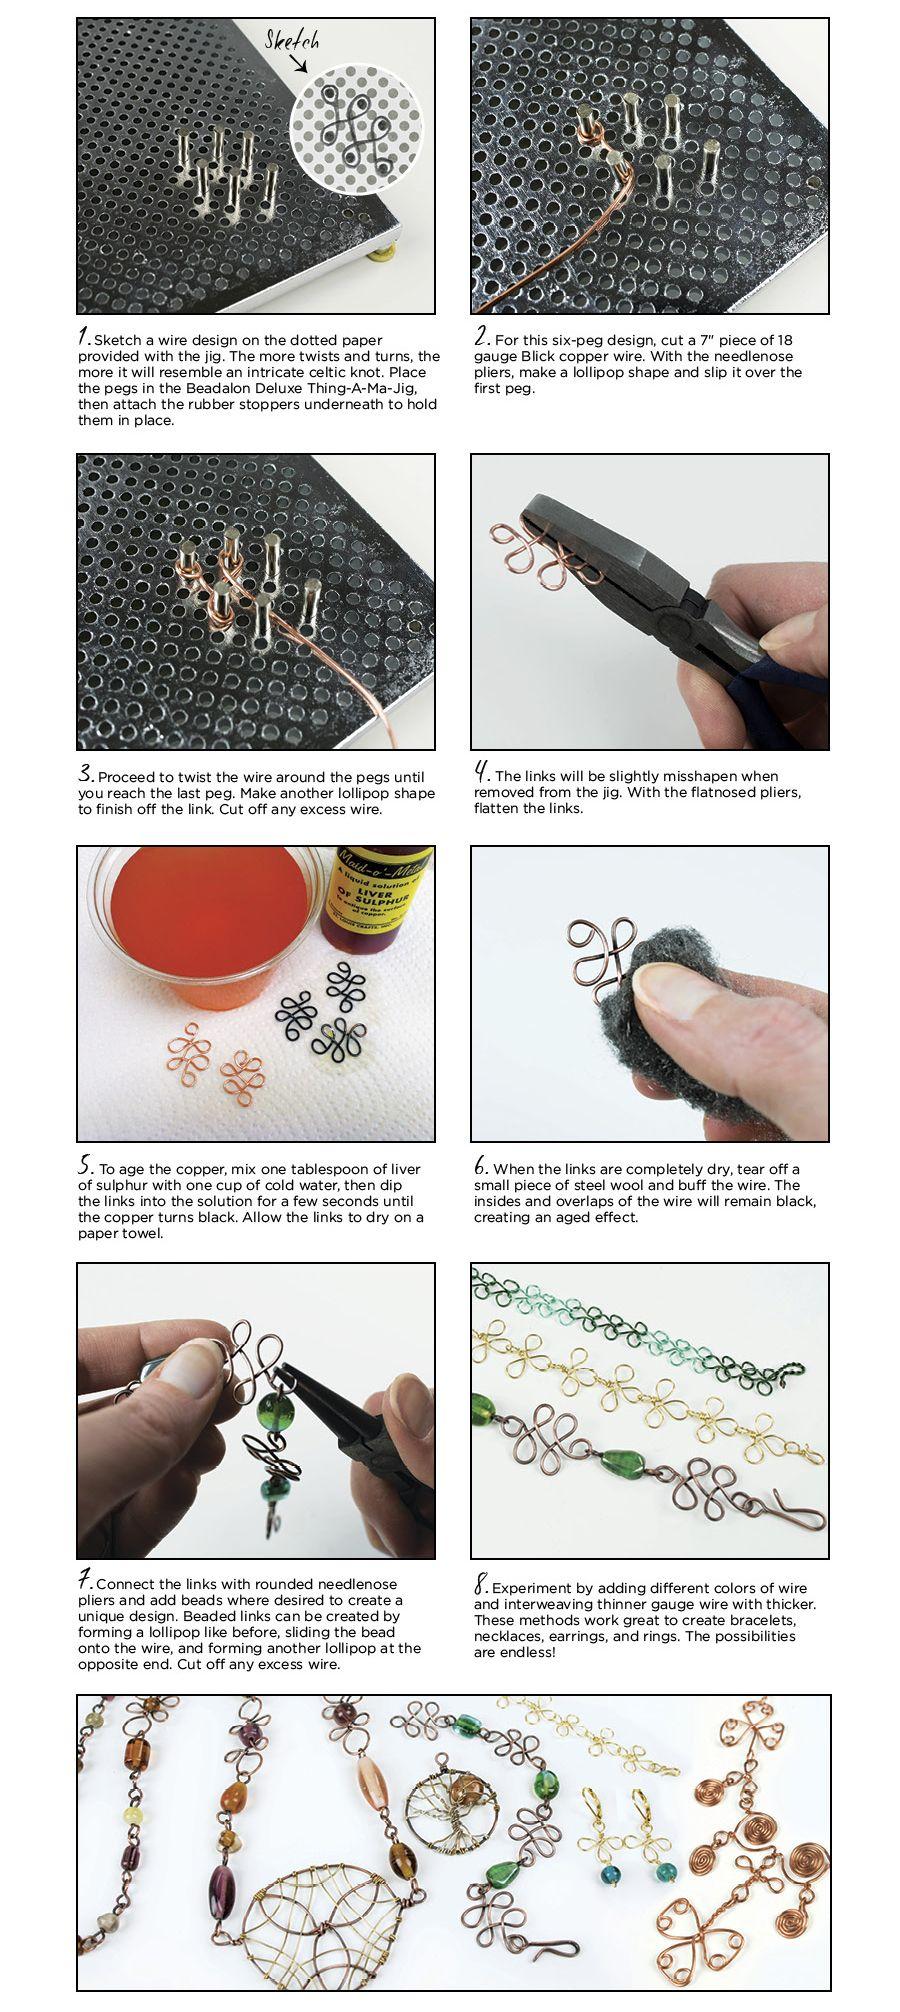 Pin by Tammy Kliewer on Art- Sculptures | Pinterest | Celtic wire ...